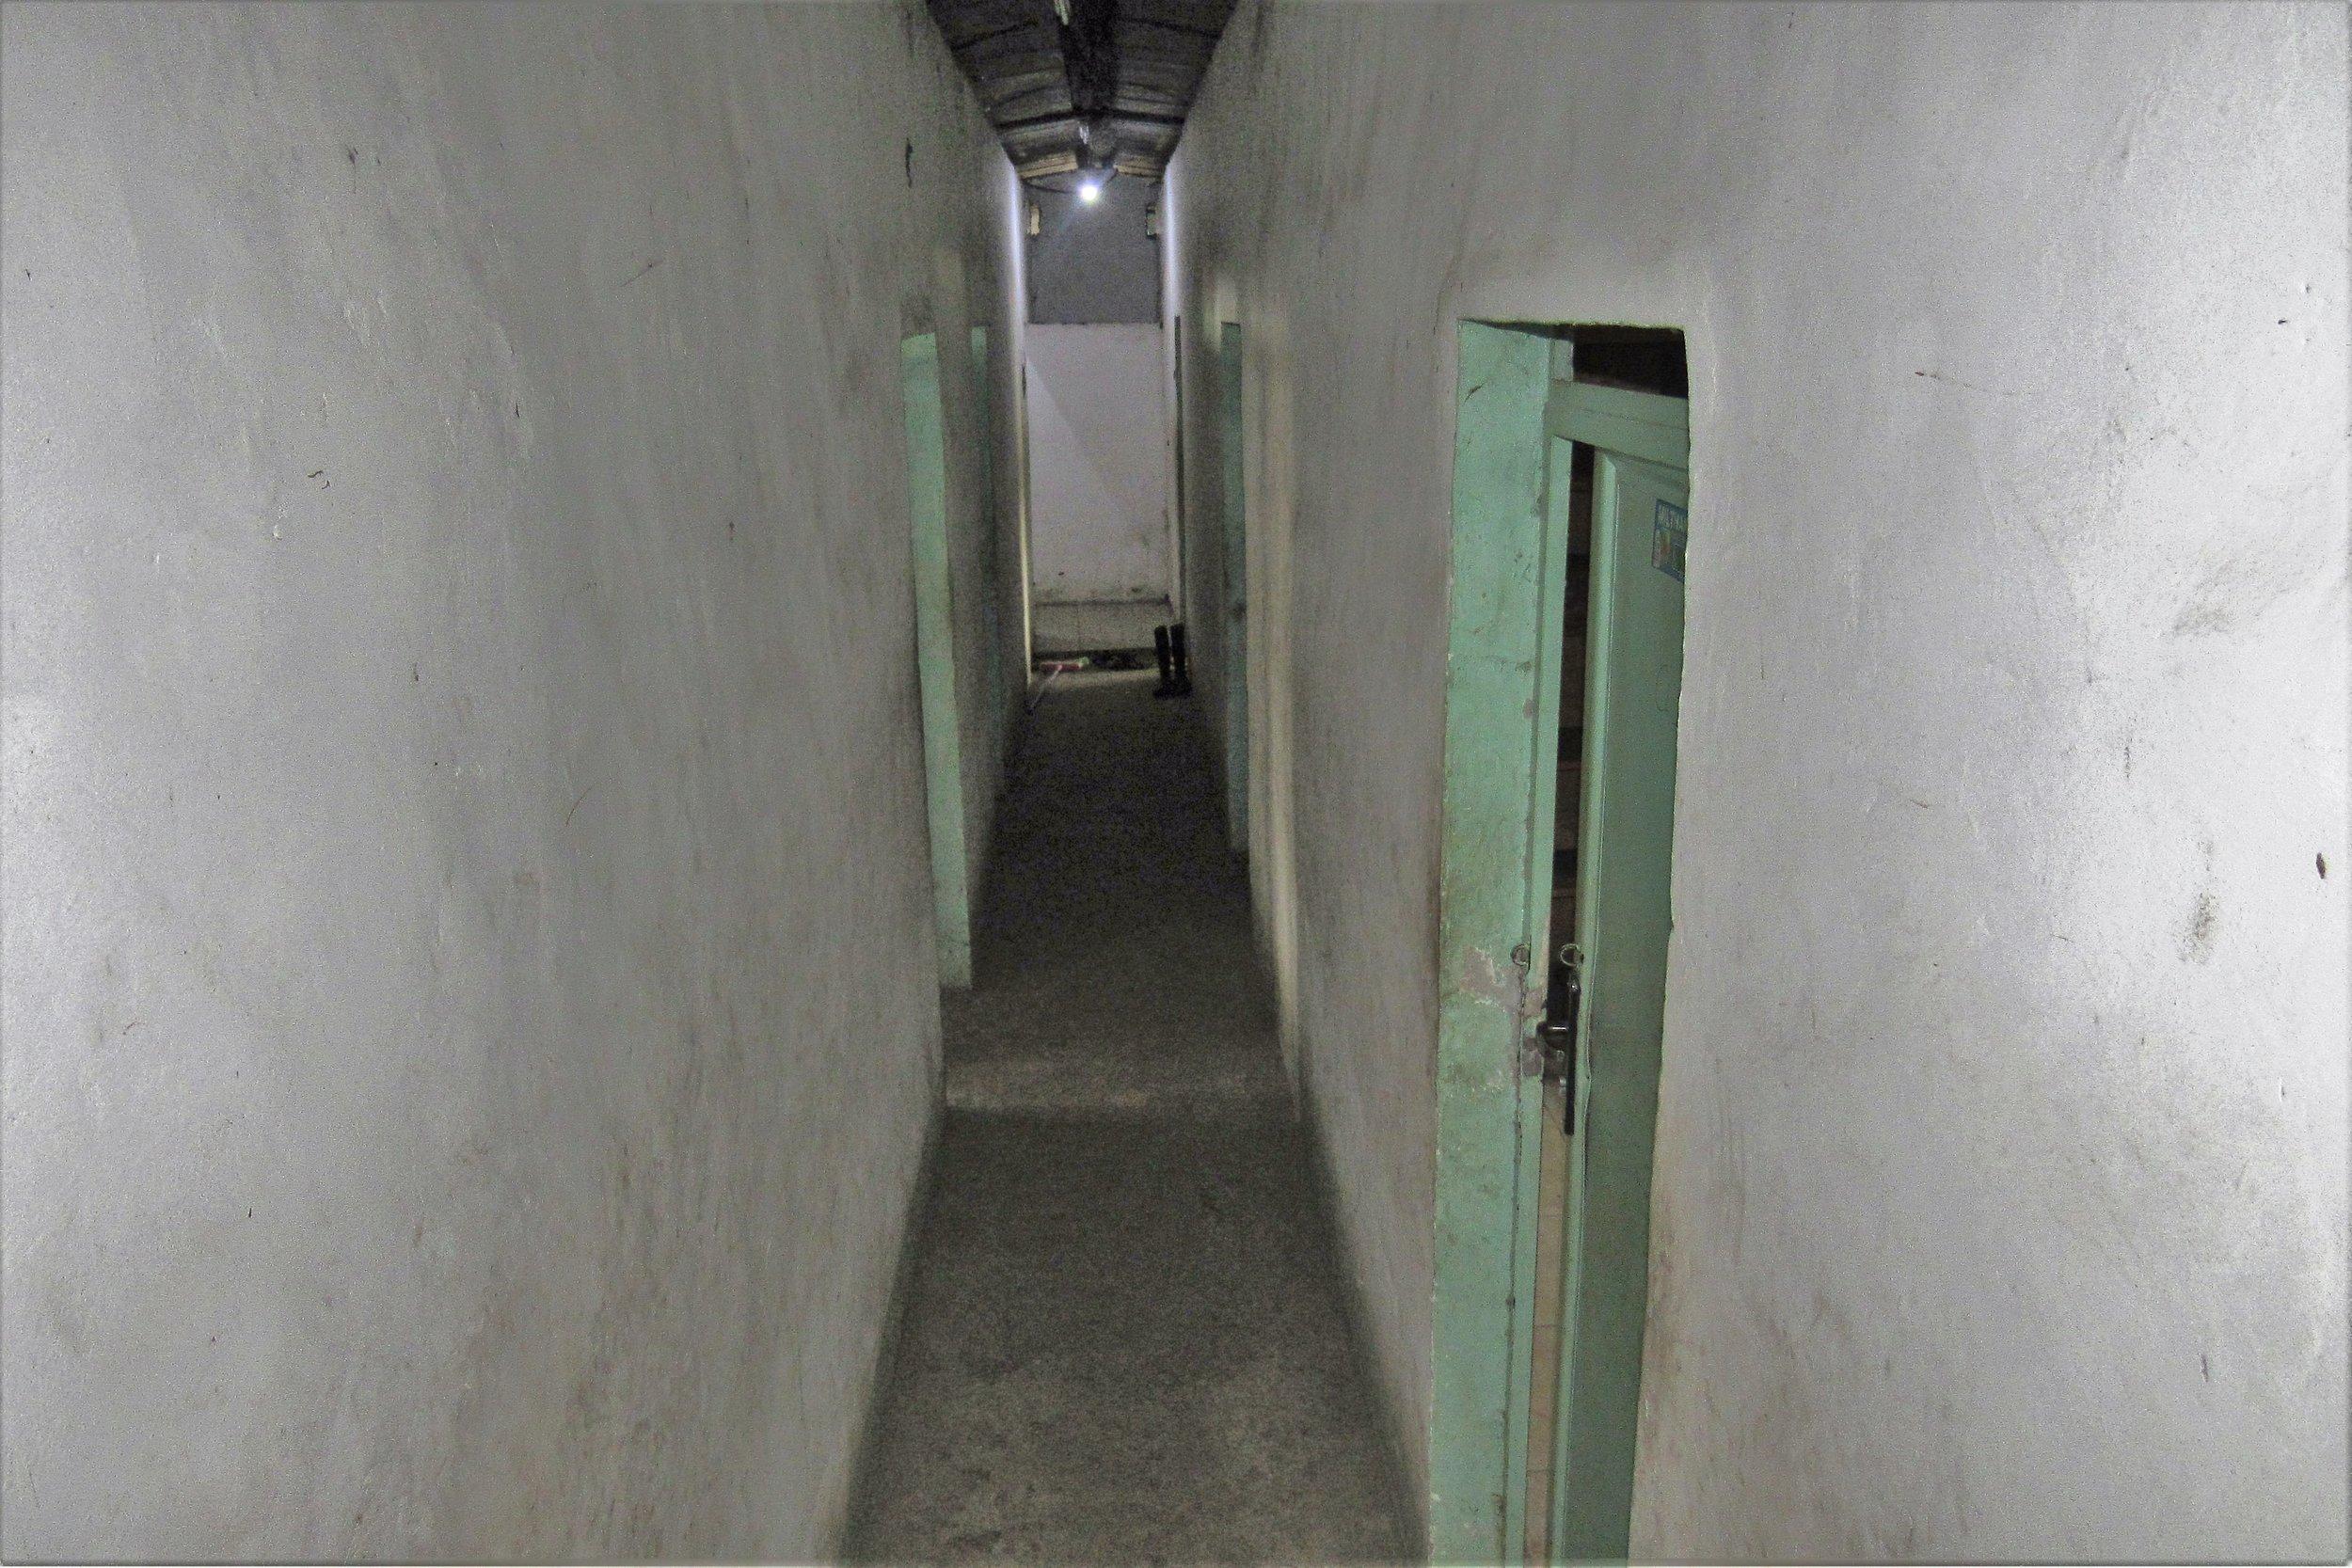 Couloir (Foyer Simbiliki)